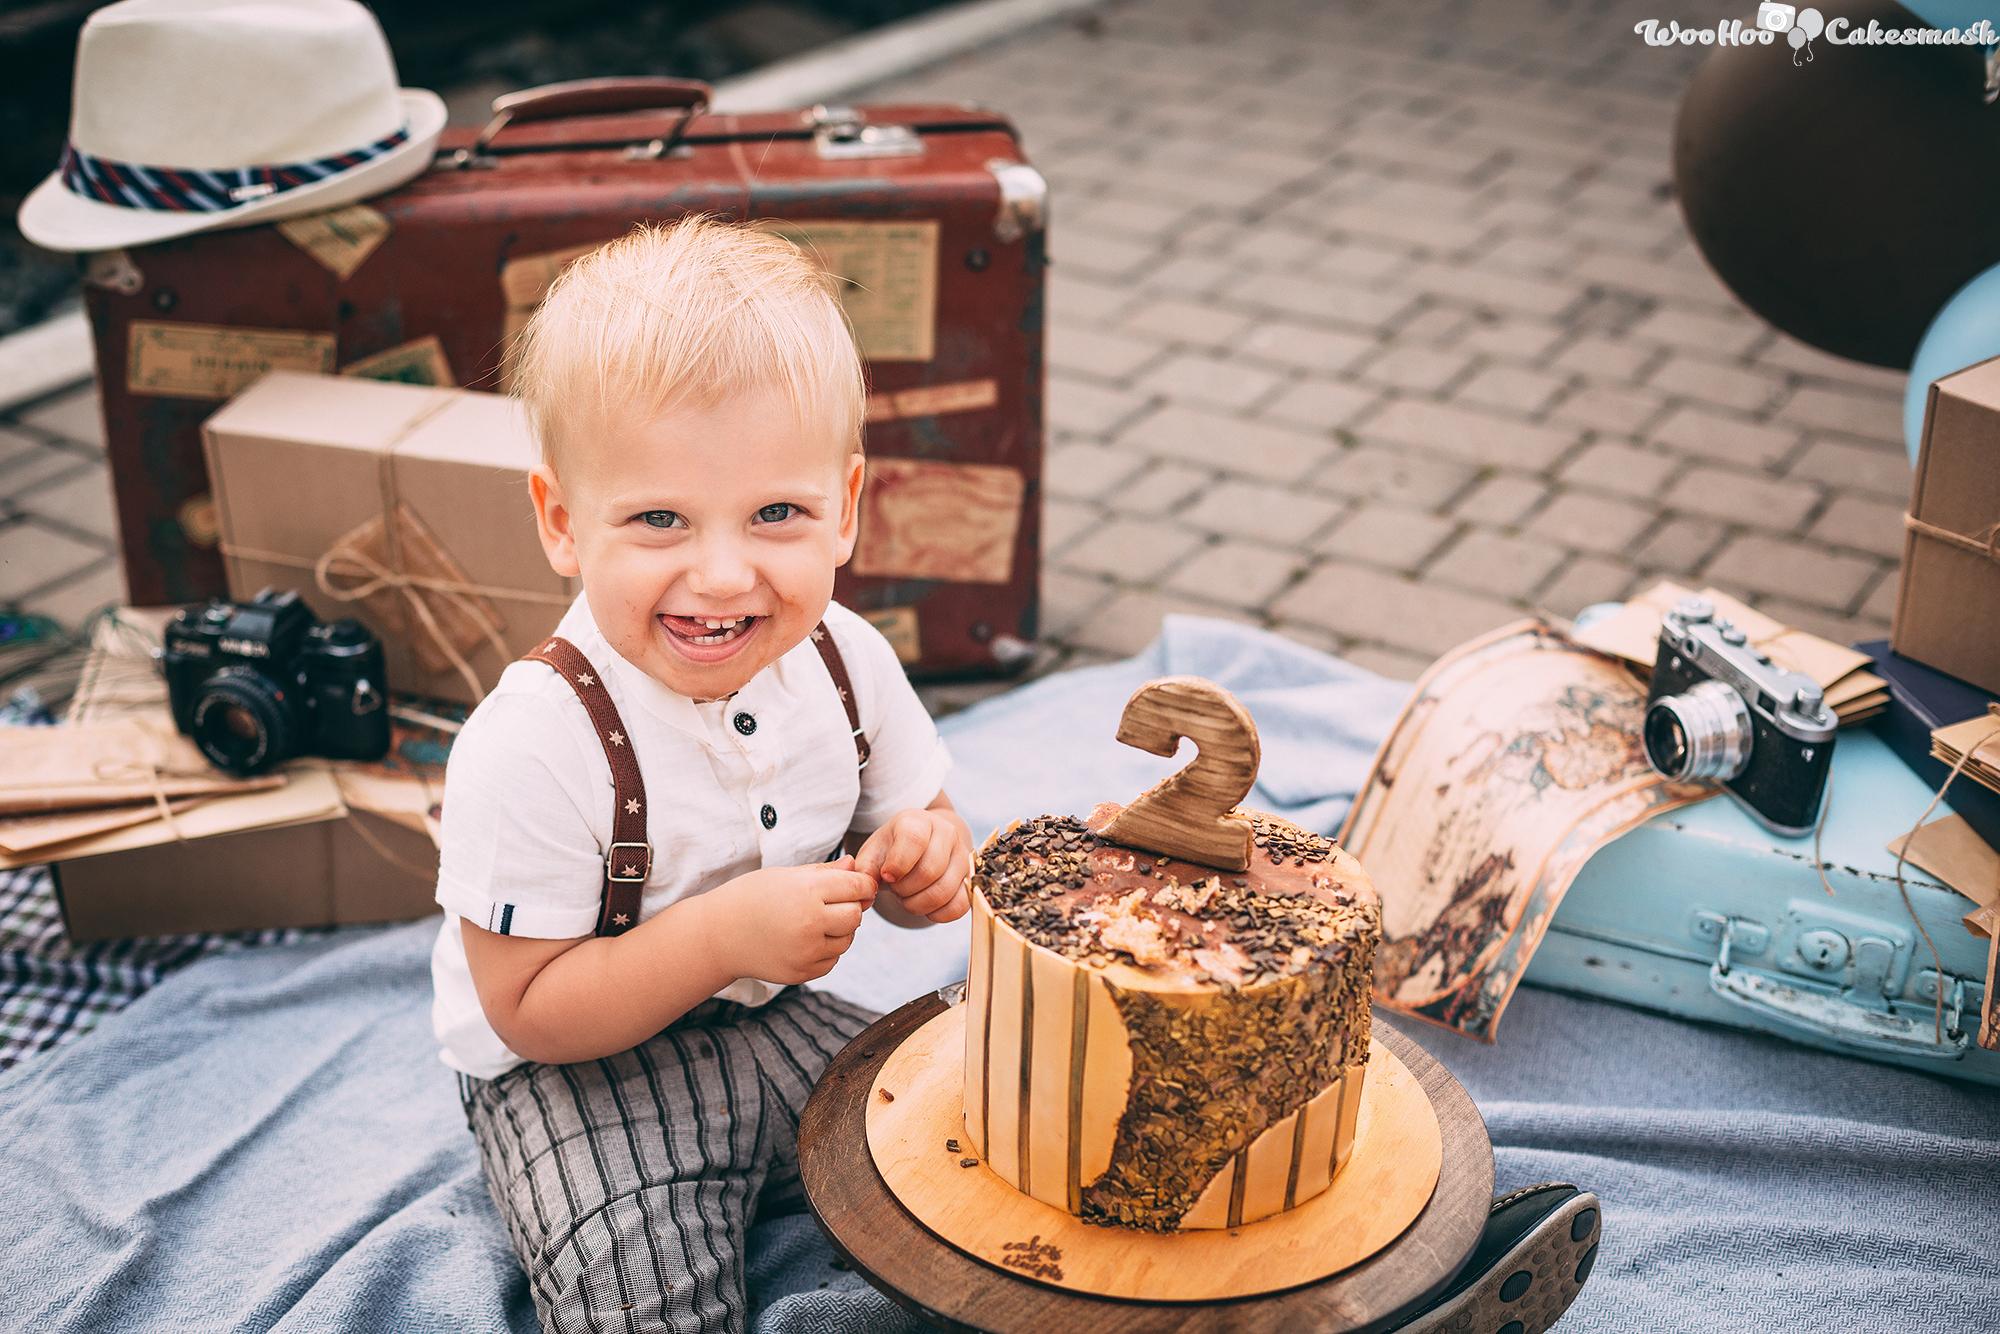 woohoo_cakesmash_Andrey_vintage_8